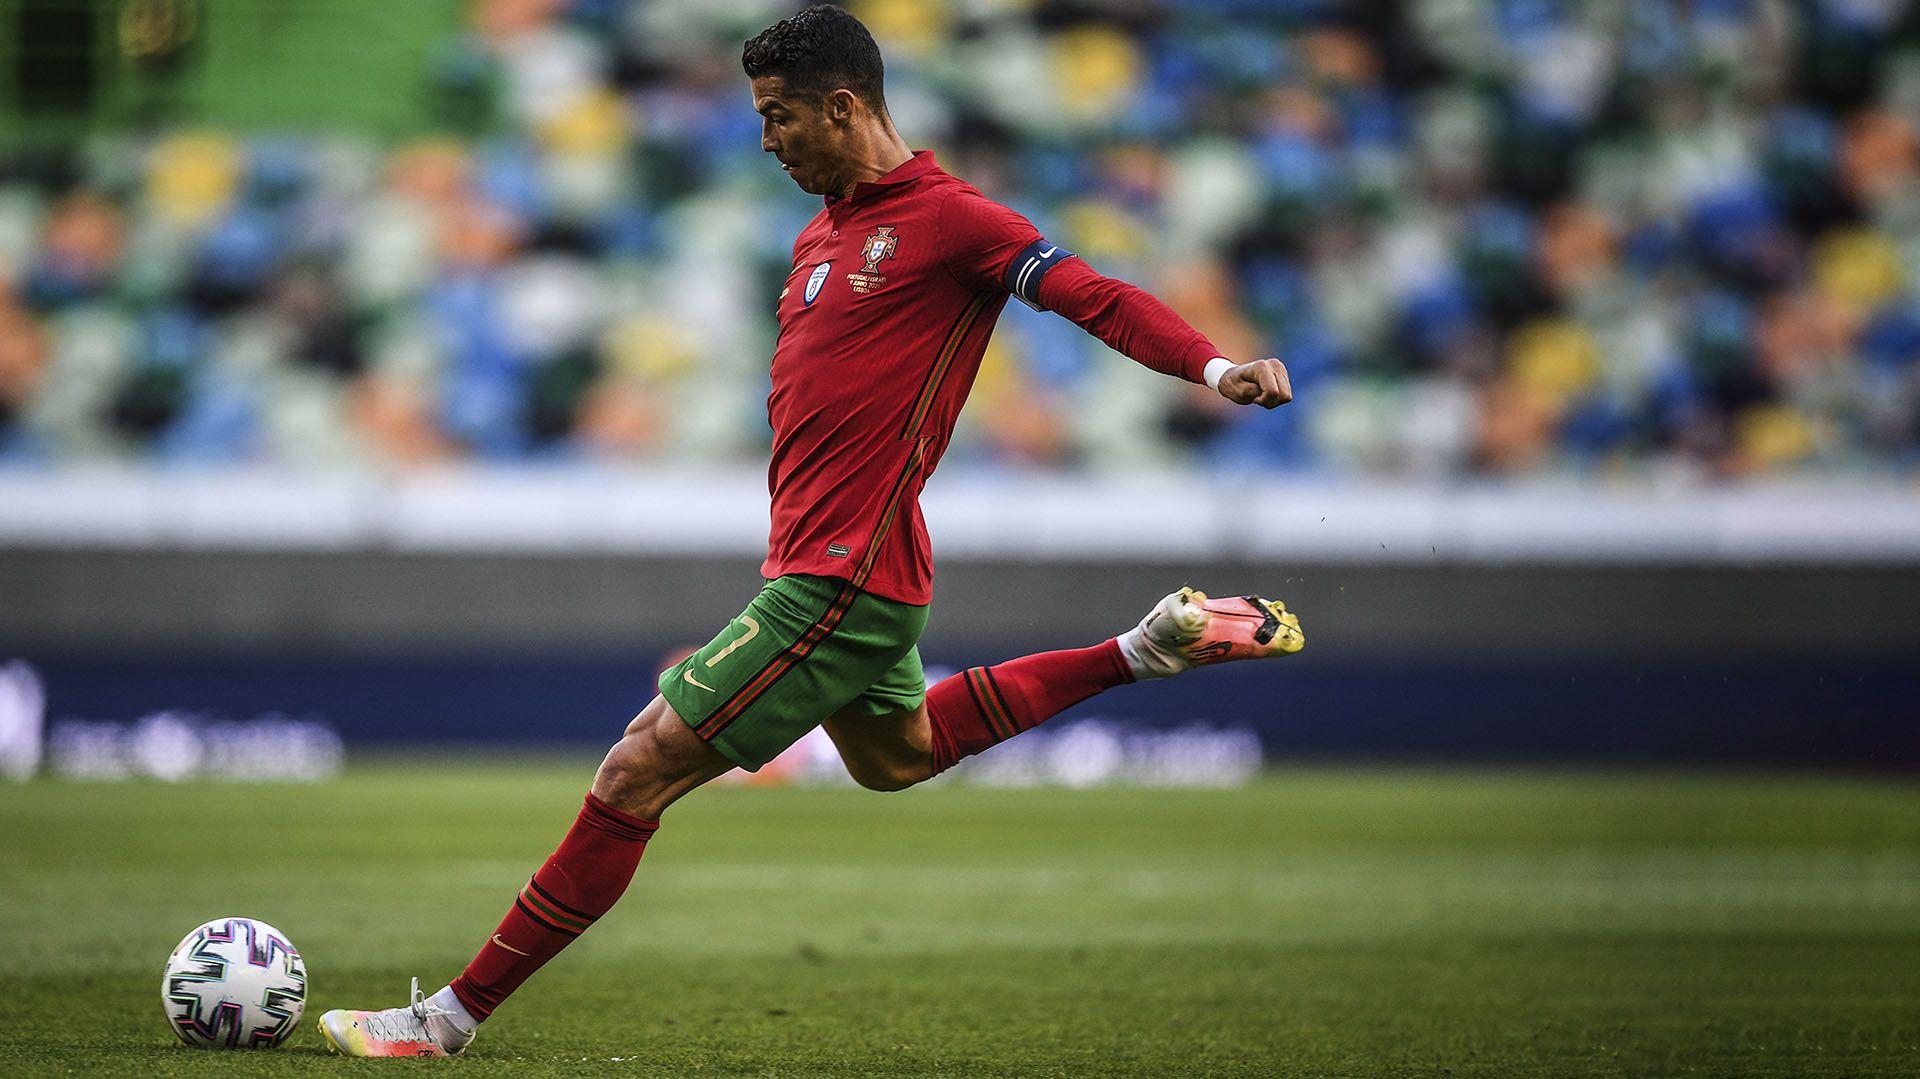 El tiro libre de Ronaldo que se volvió viral